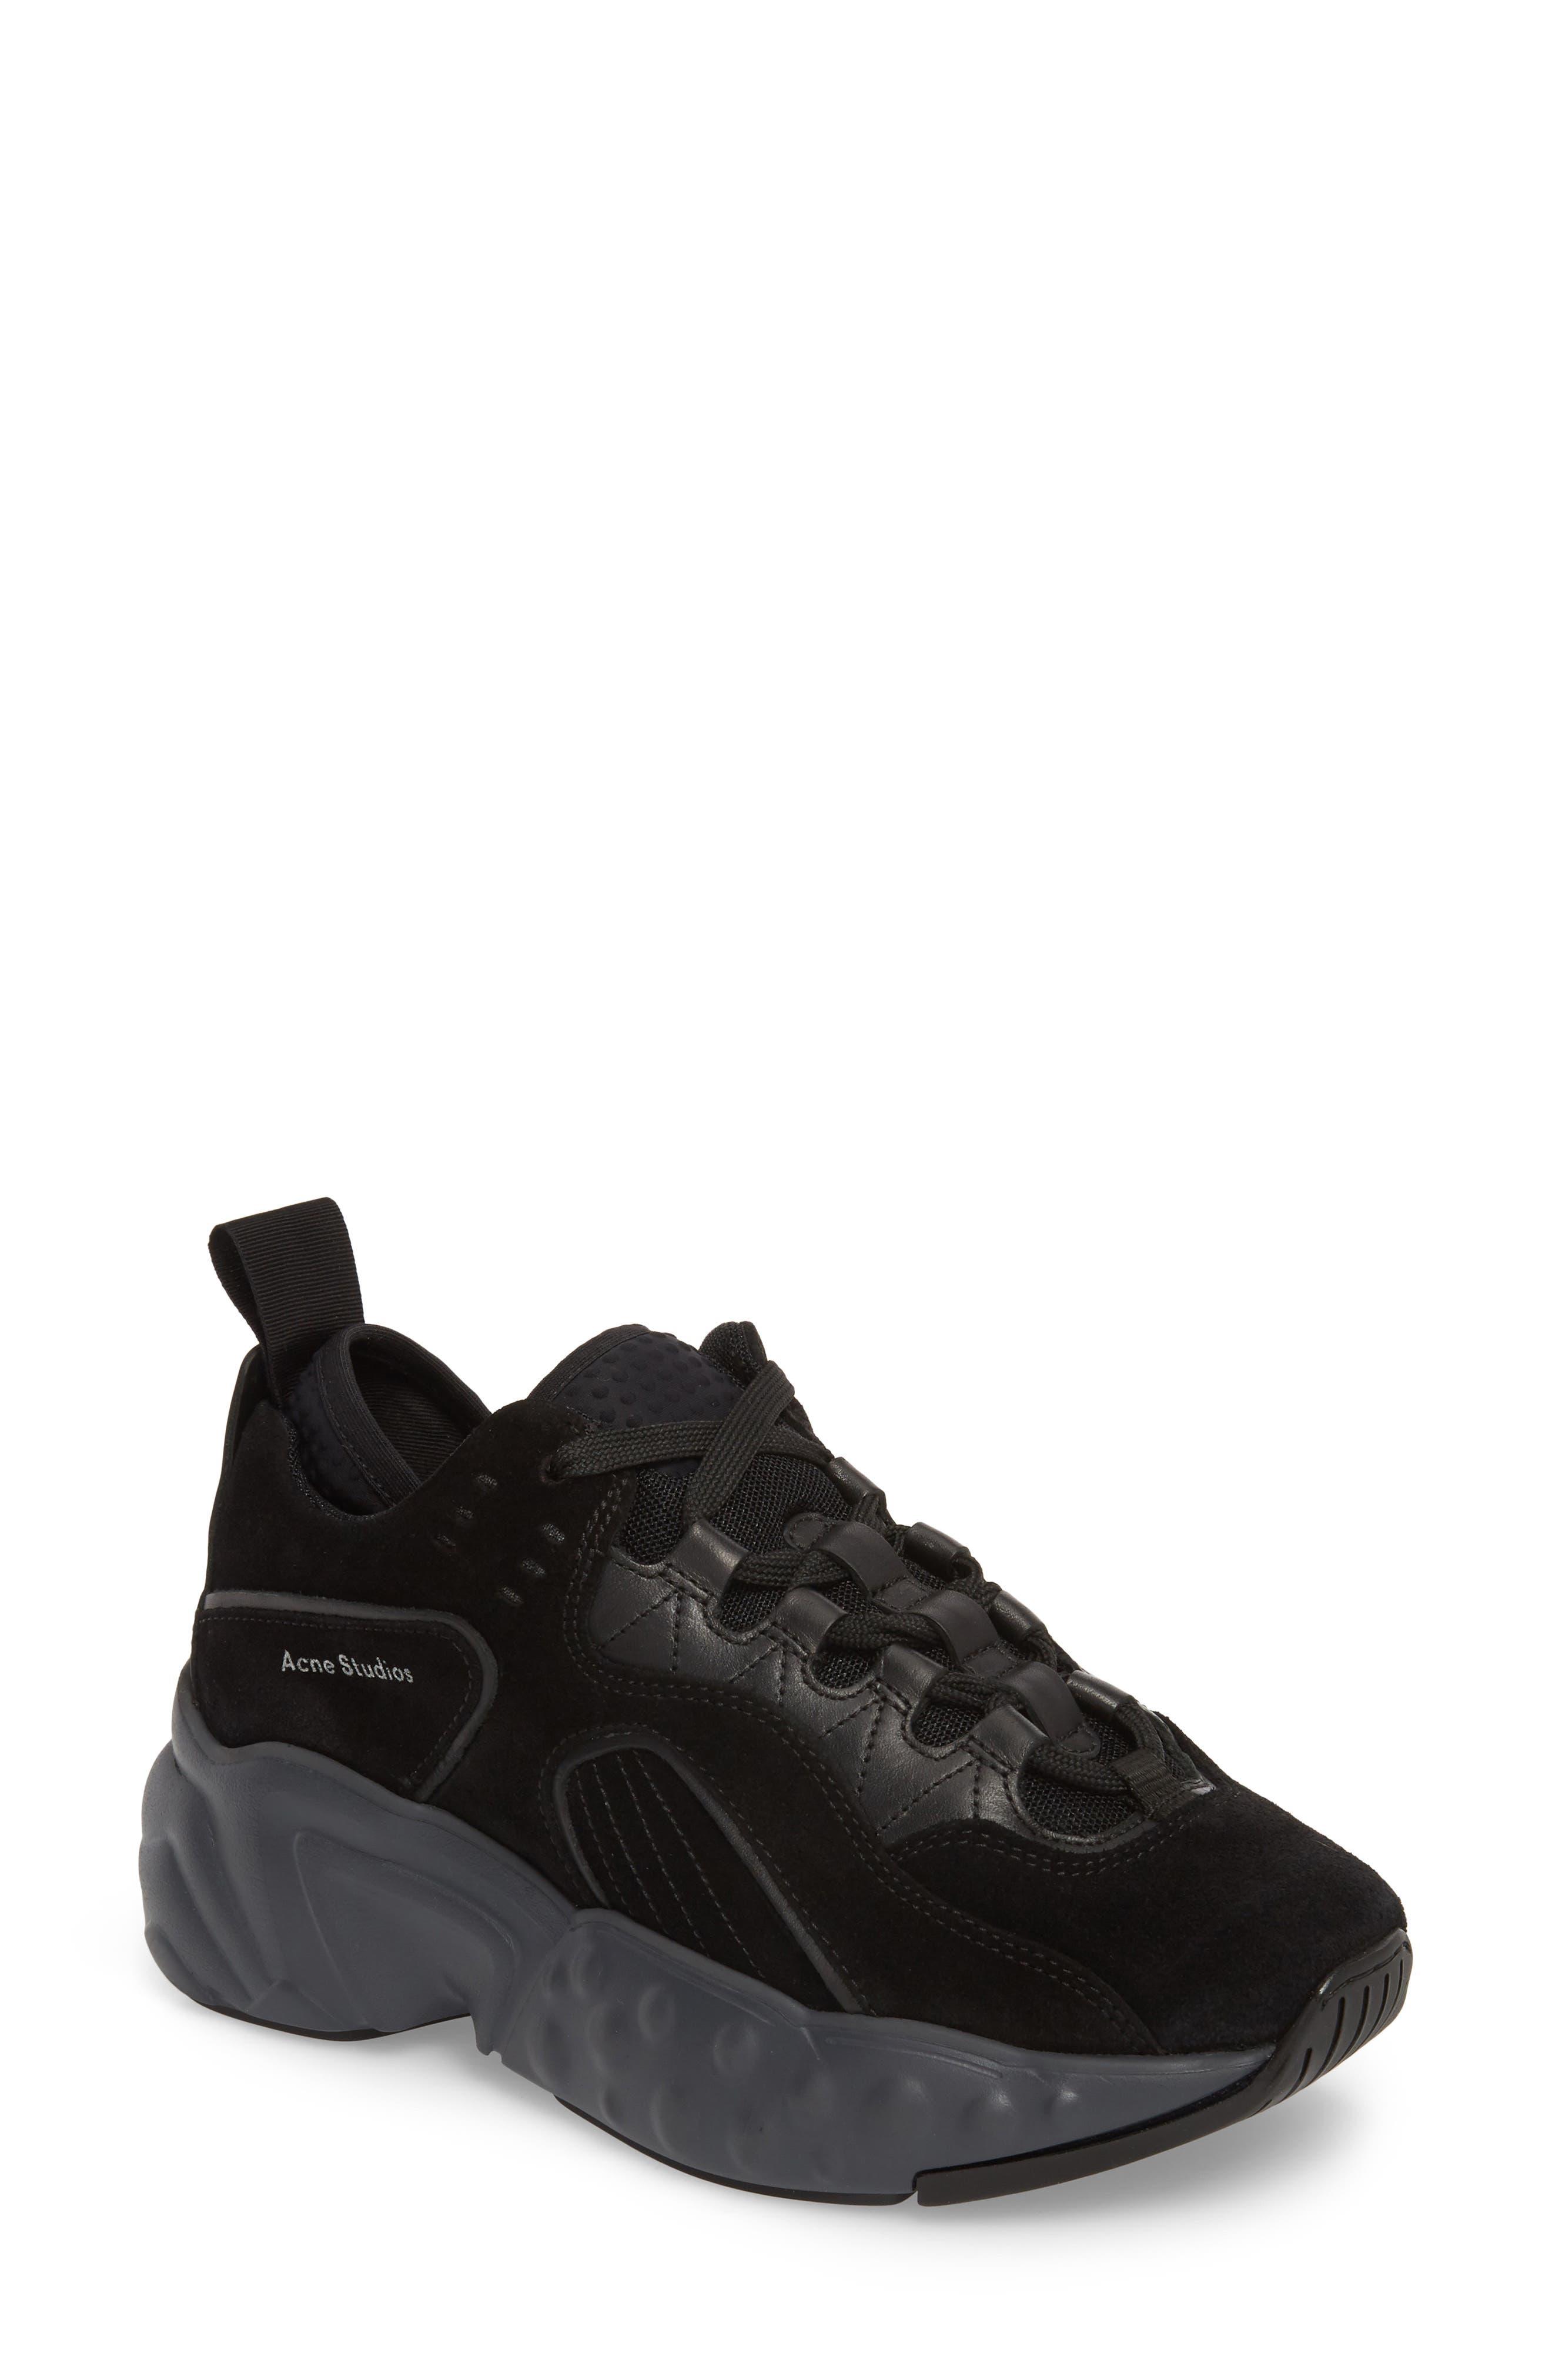 ACNE STUDIOS Manhattan Sneaker, Main, color, MULTI BLACK